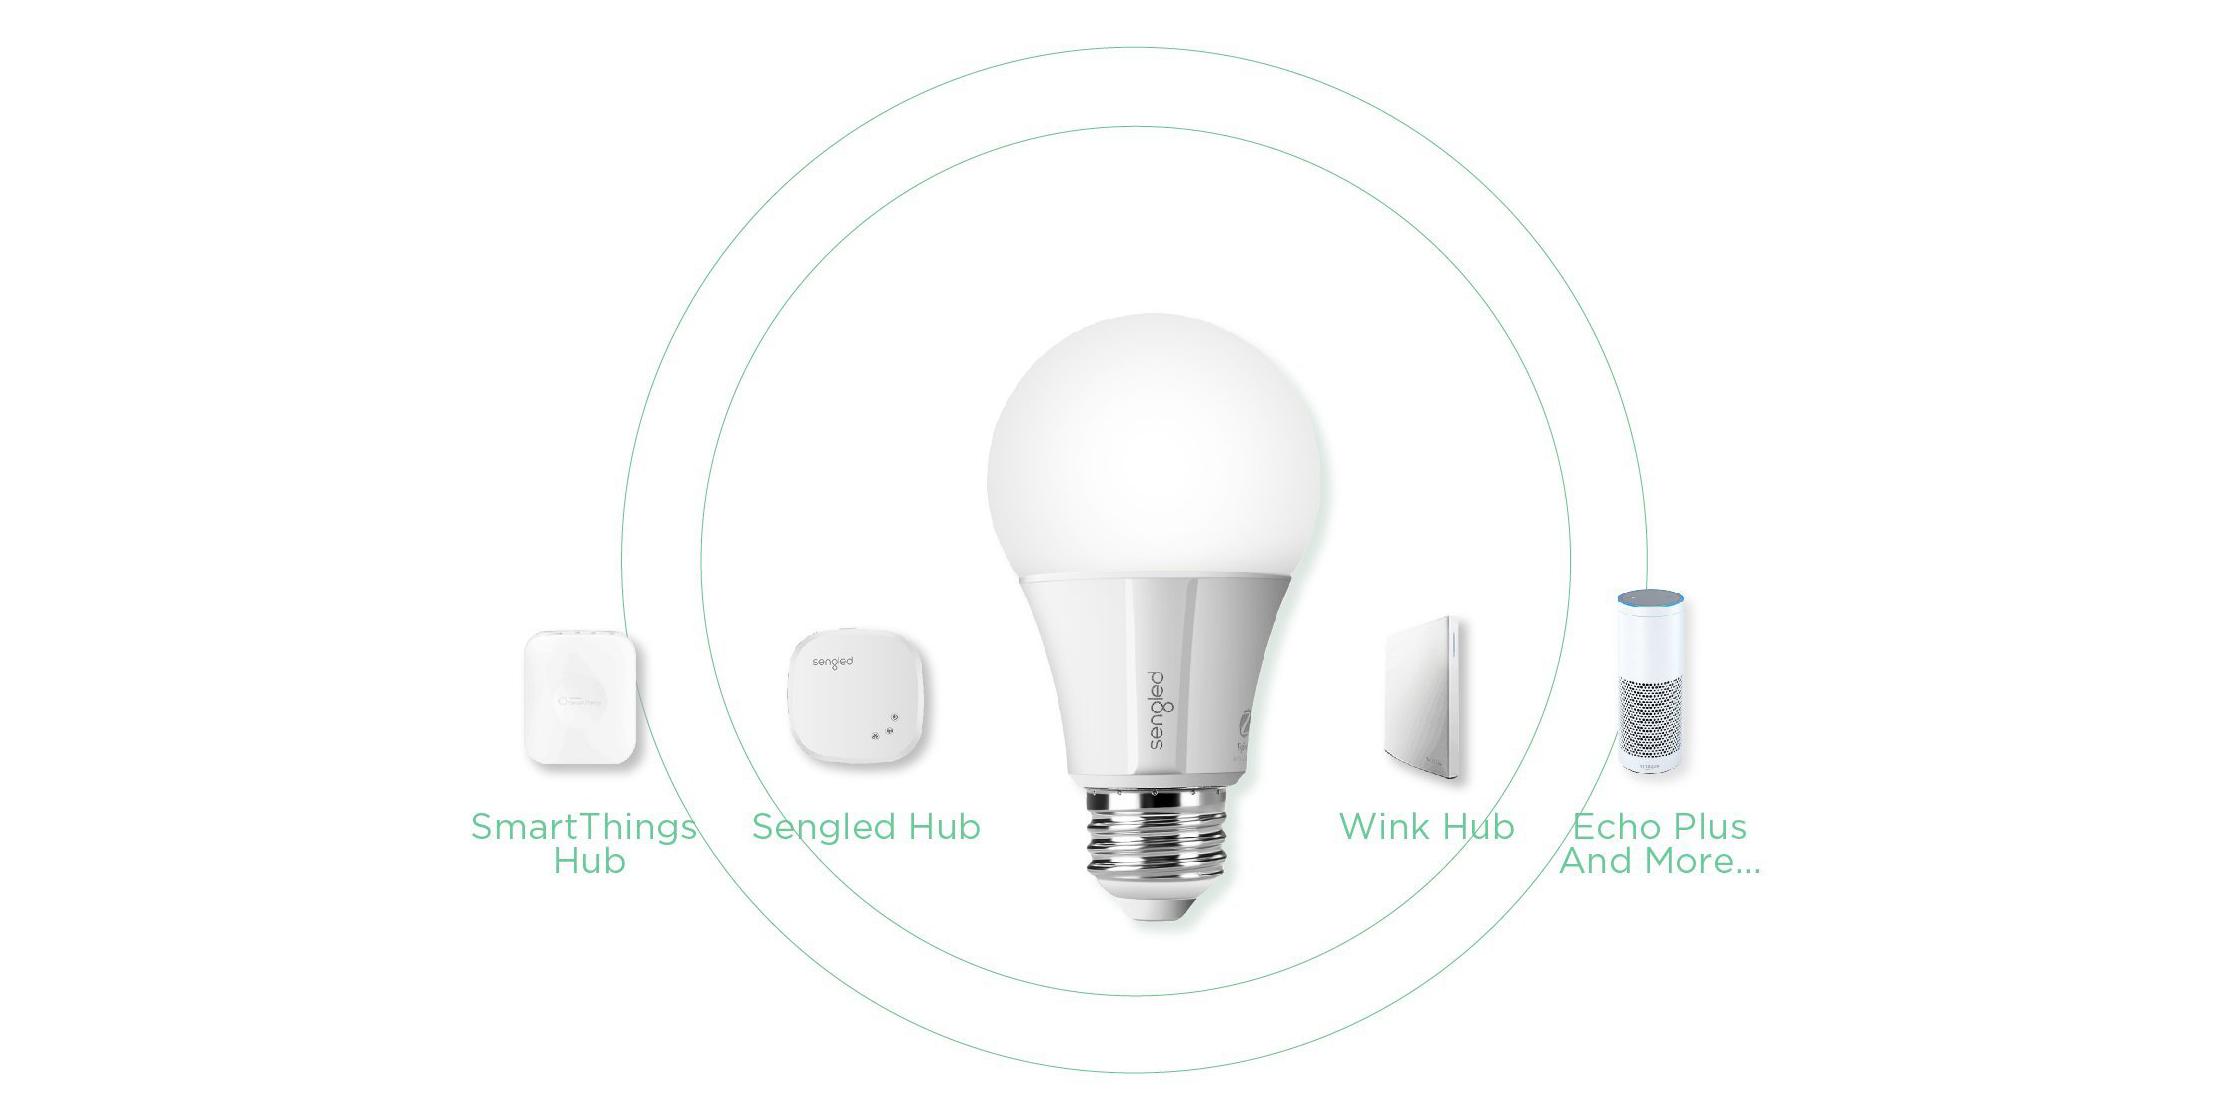 Green Deals: Sengled A19 LED Smart Light Bulbs $7, more